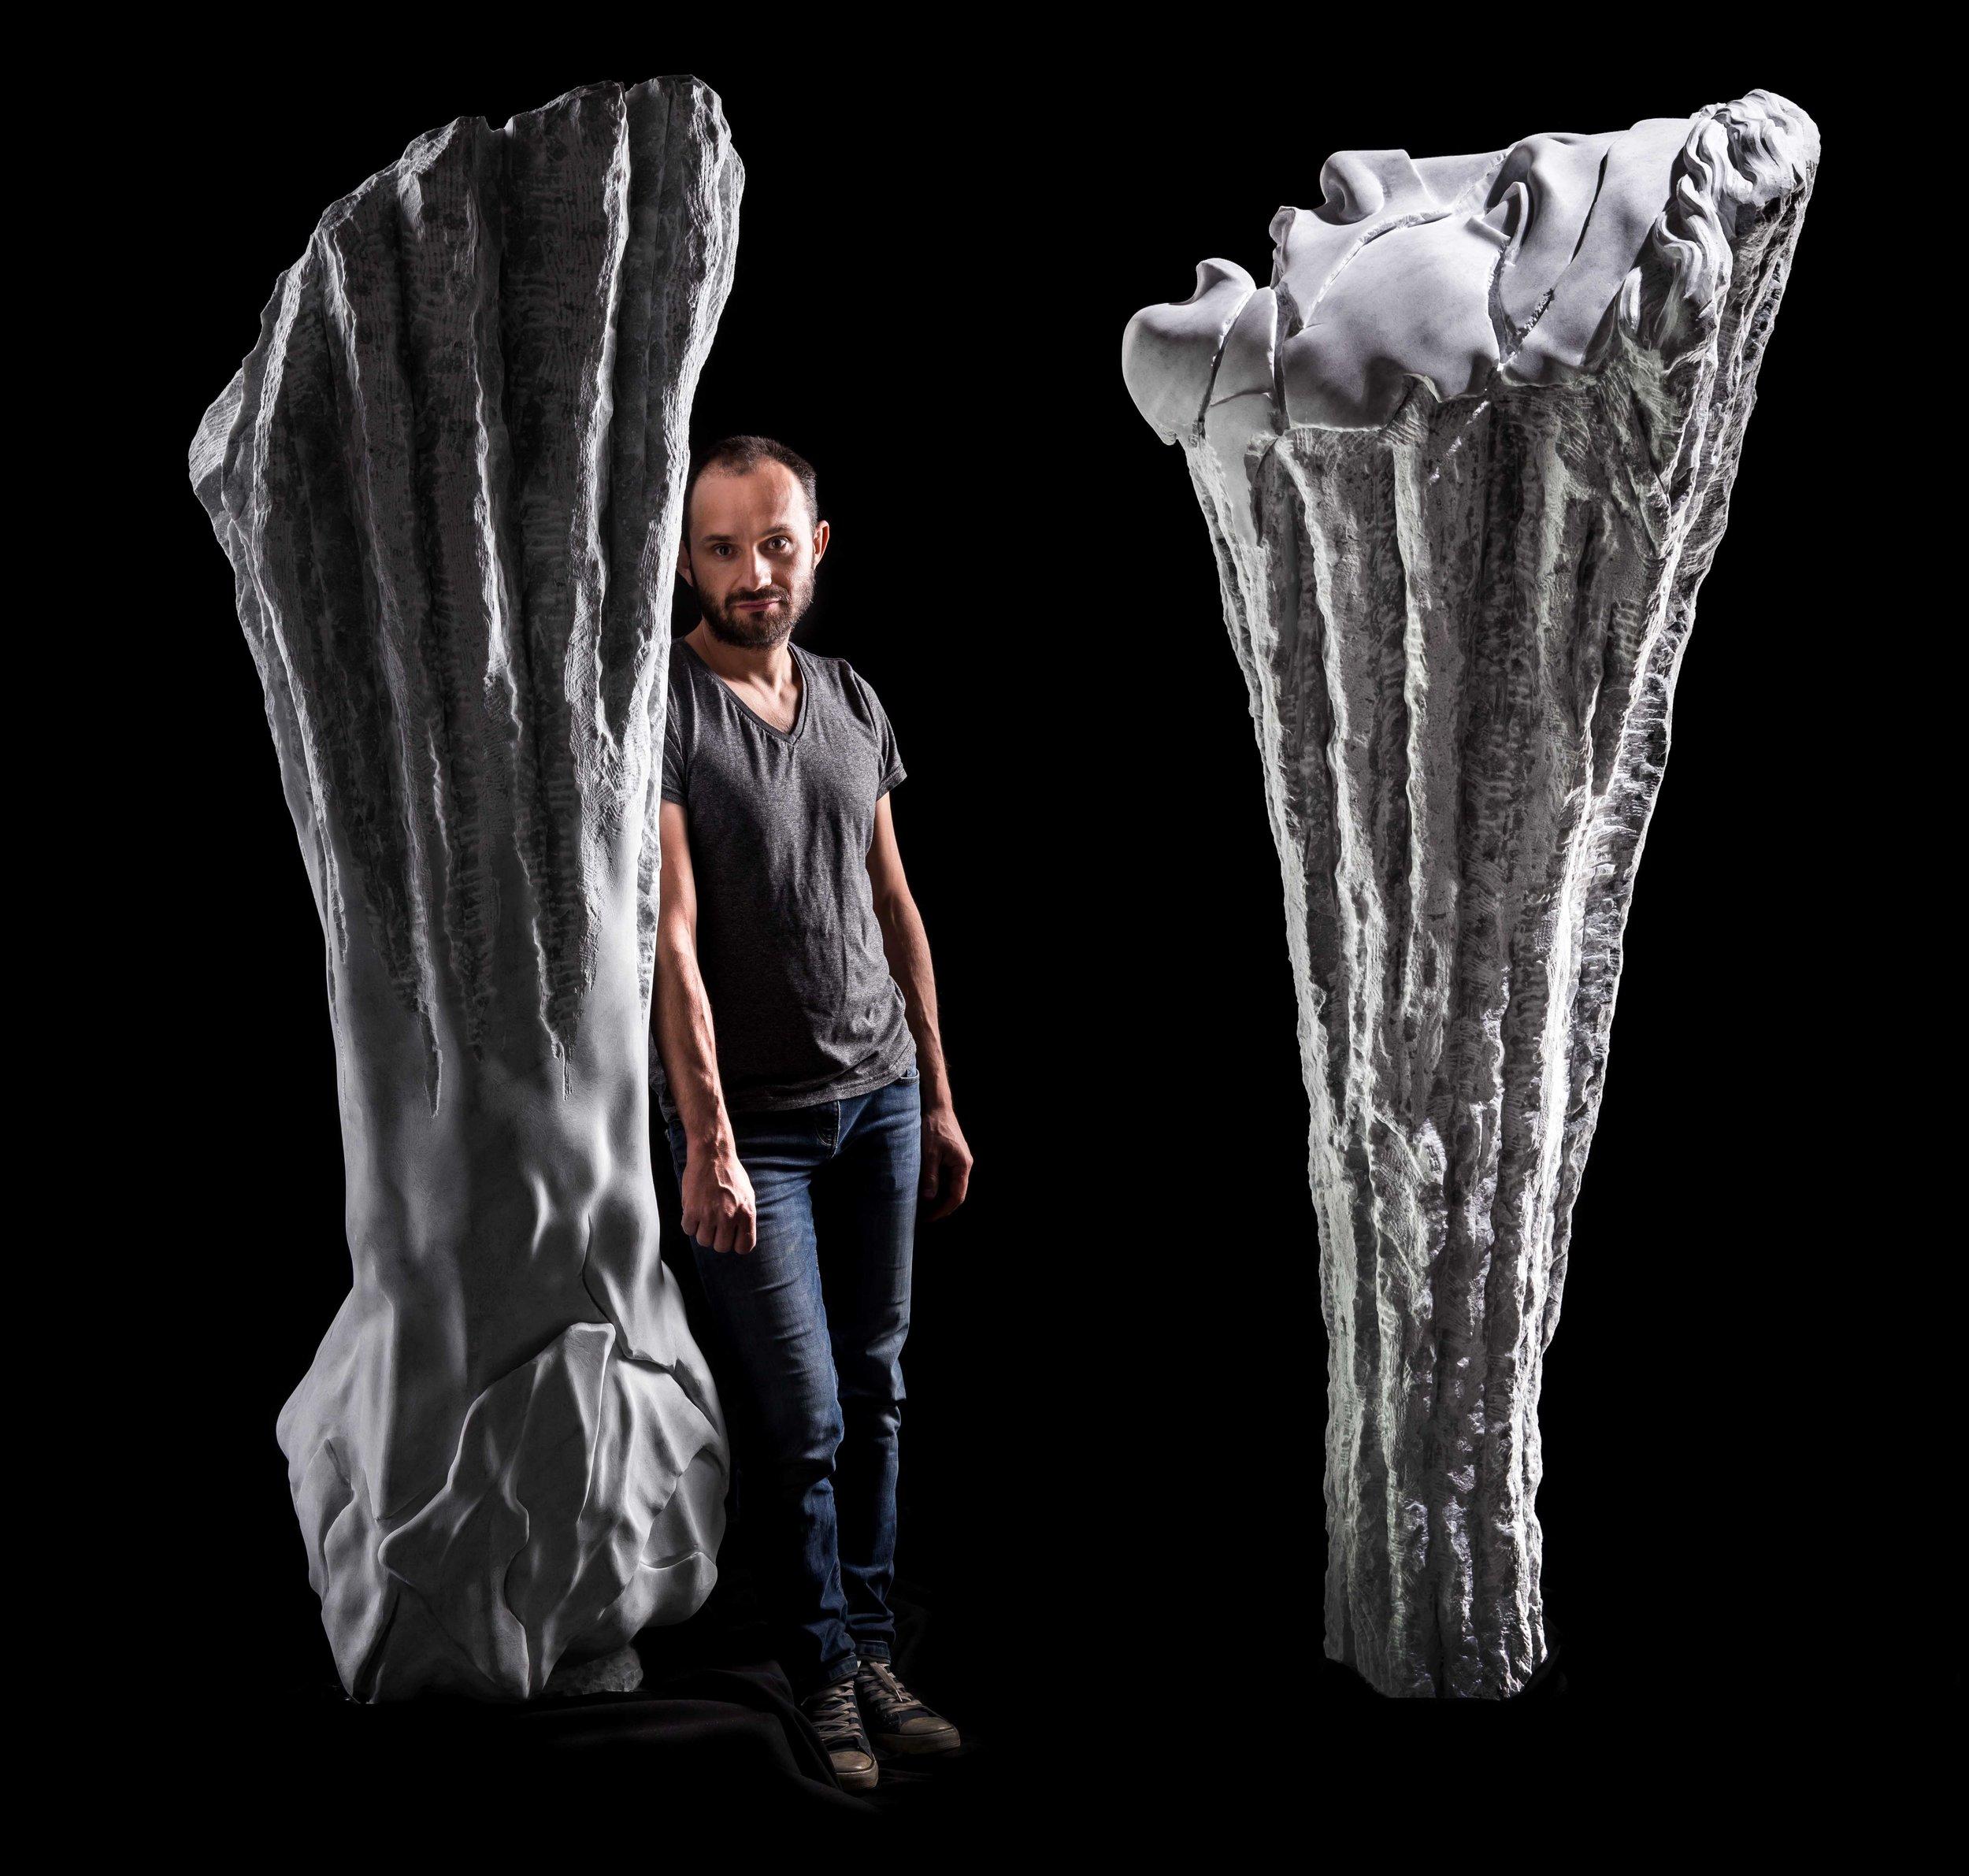 Diptych: Scream of the Earth & Self-Destructive, 2018, Carrara marble